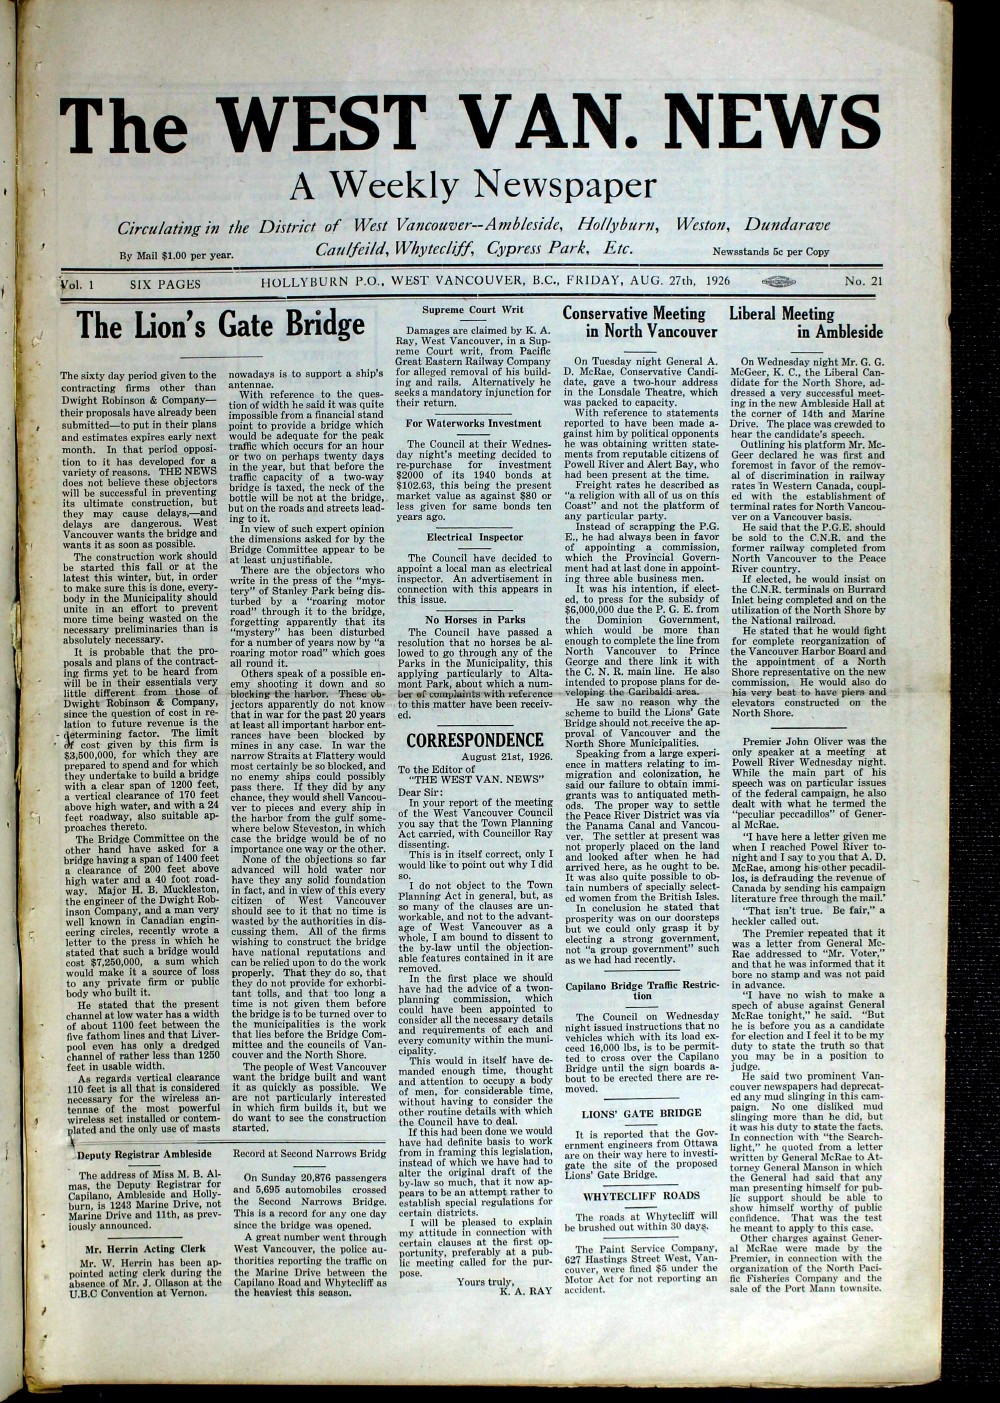 West Van. News (West Vancouver), 27 Aug 1926